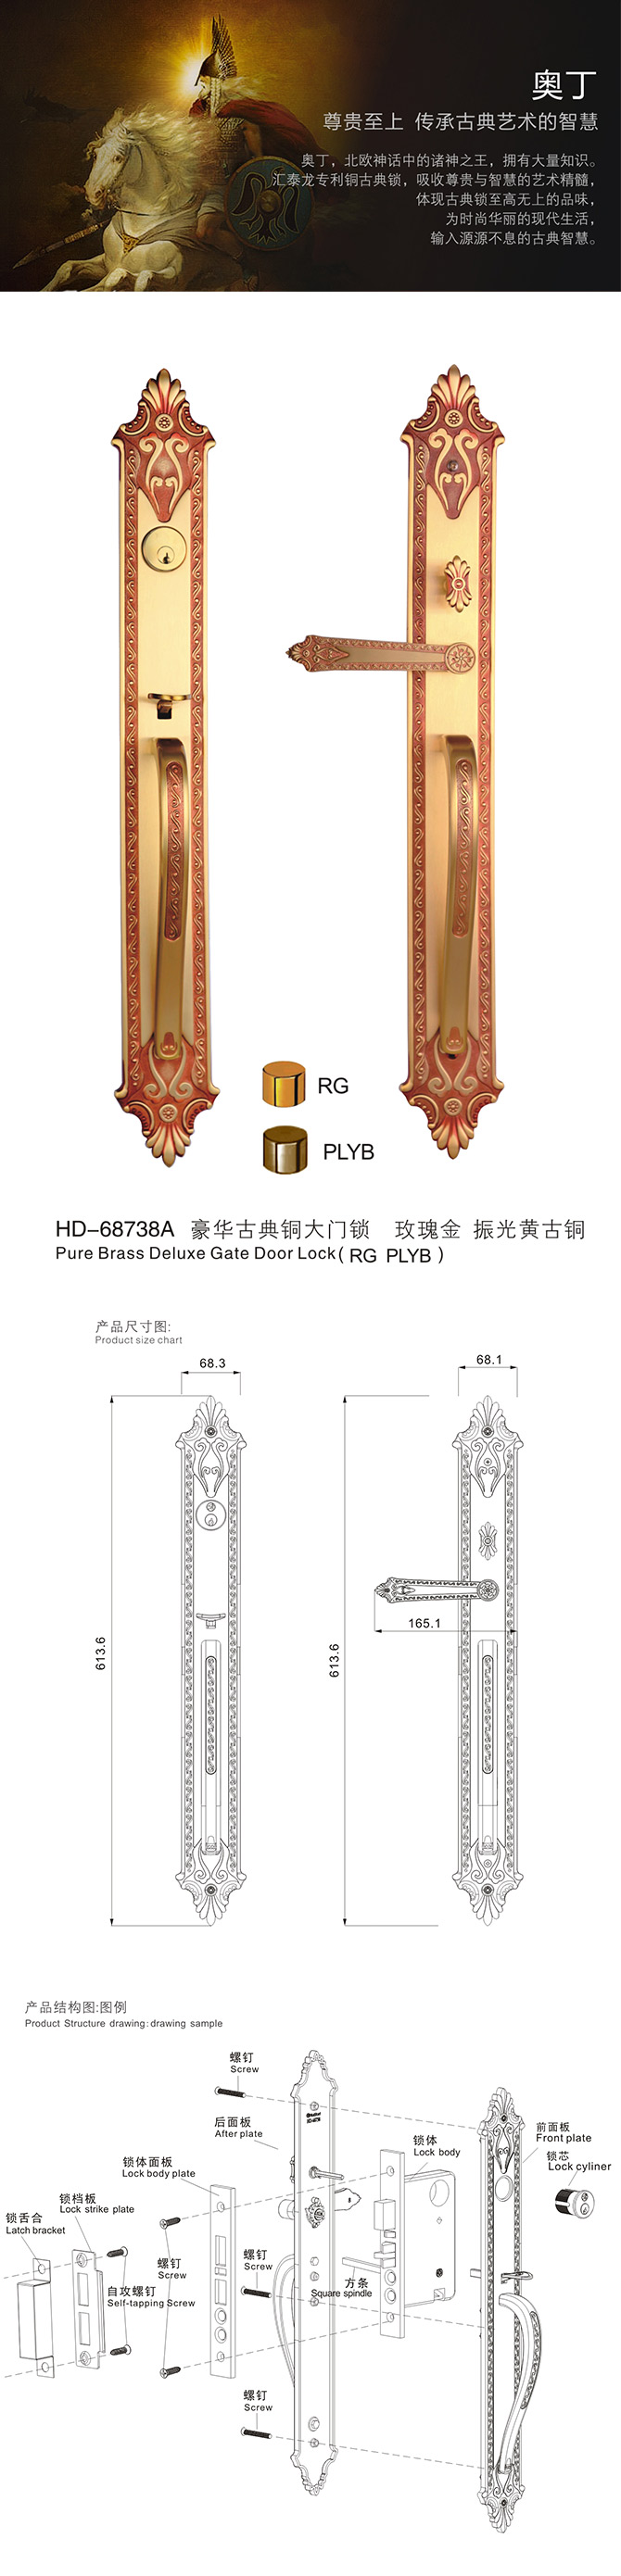 HD-68738A 豪华古典大门铜锁